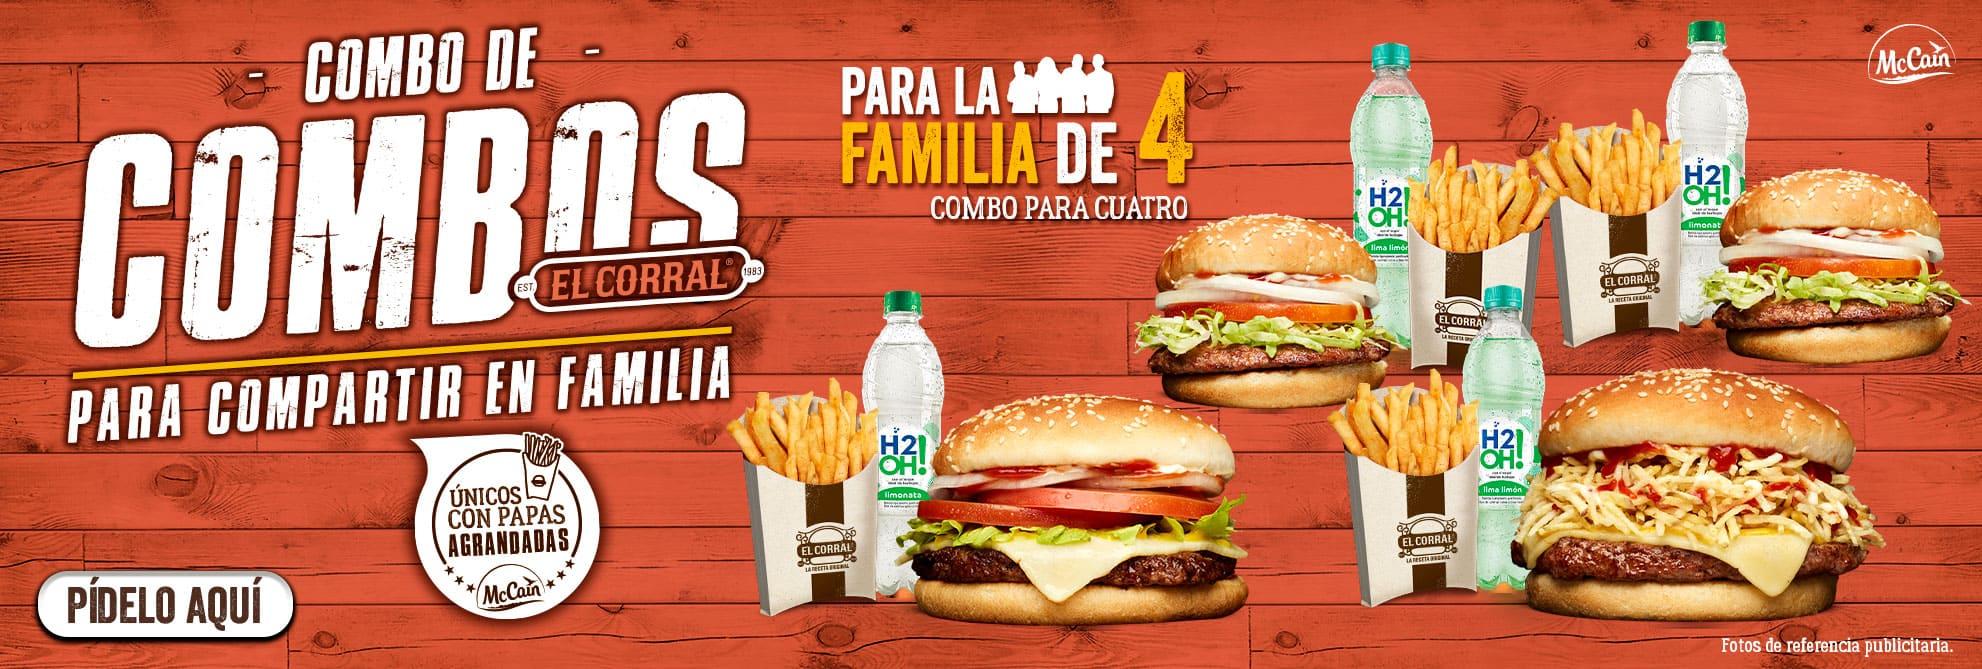 Combos de hamburguesas para compartir